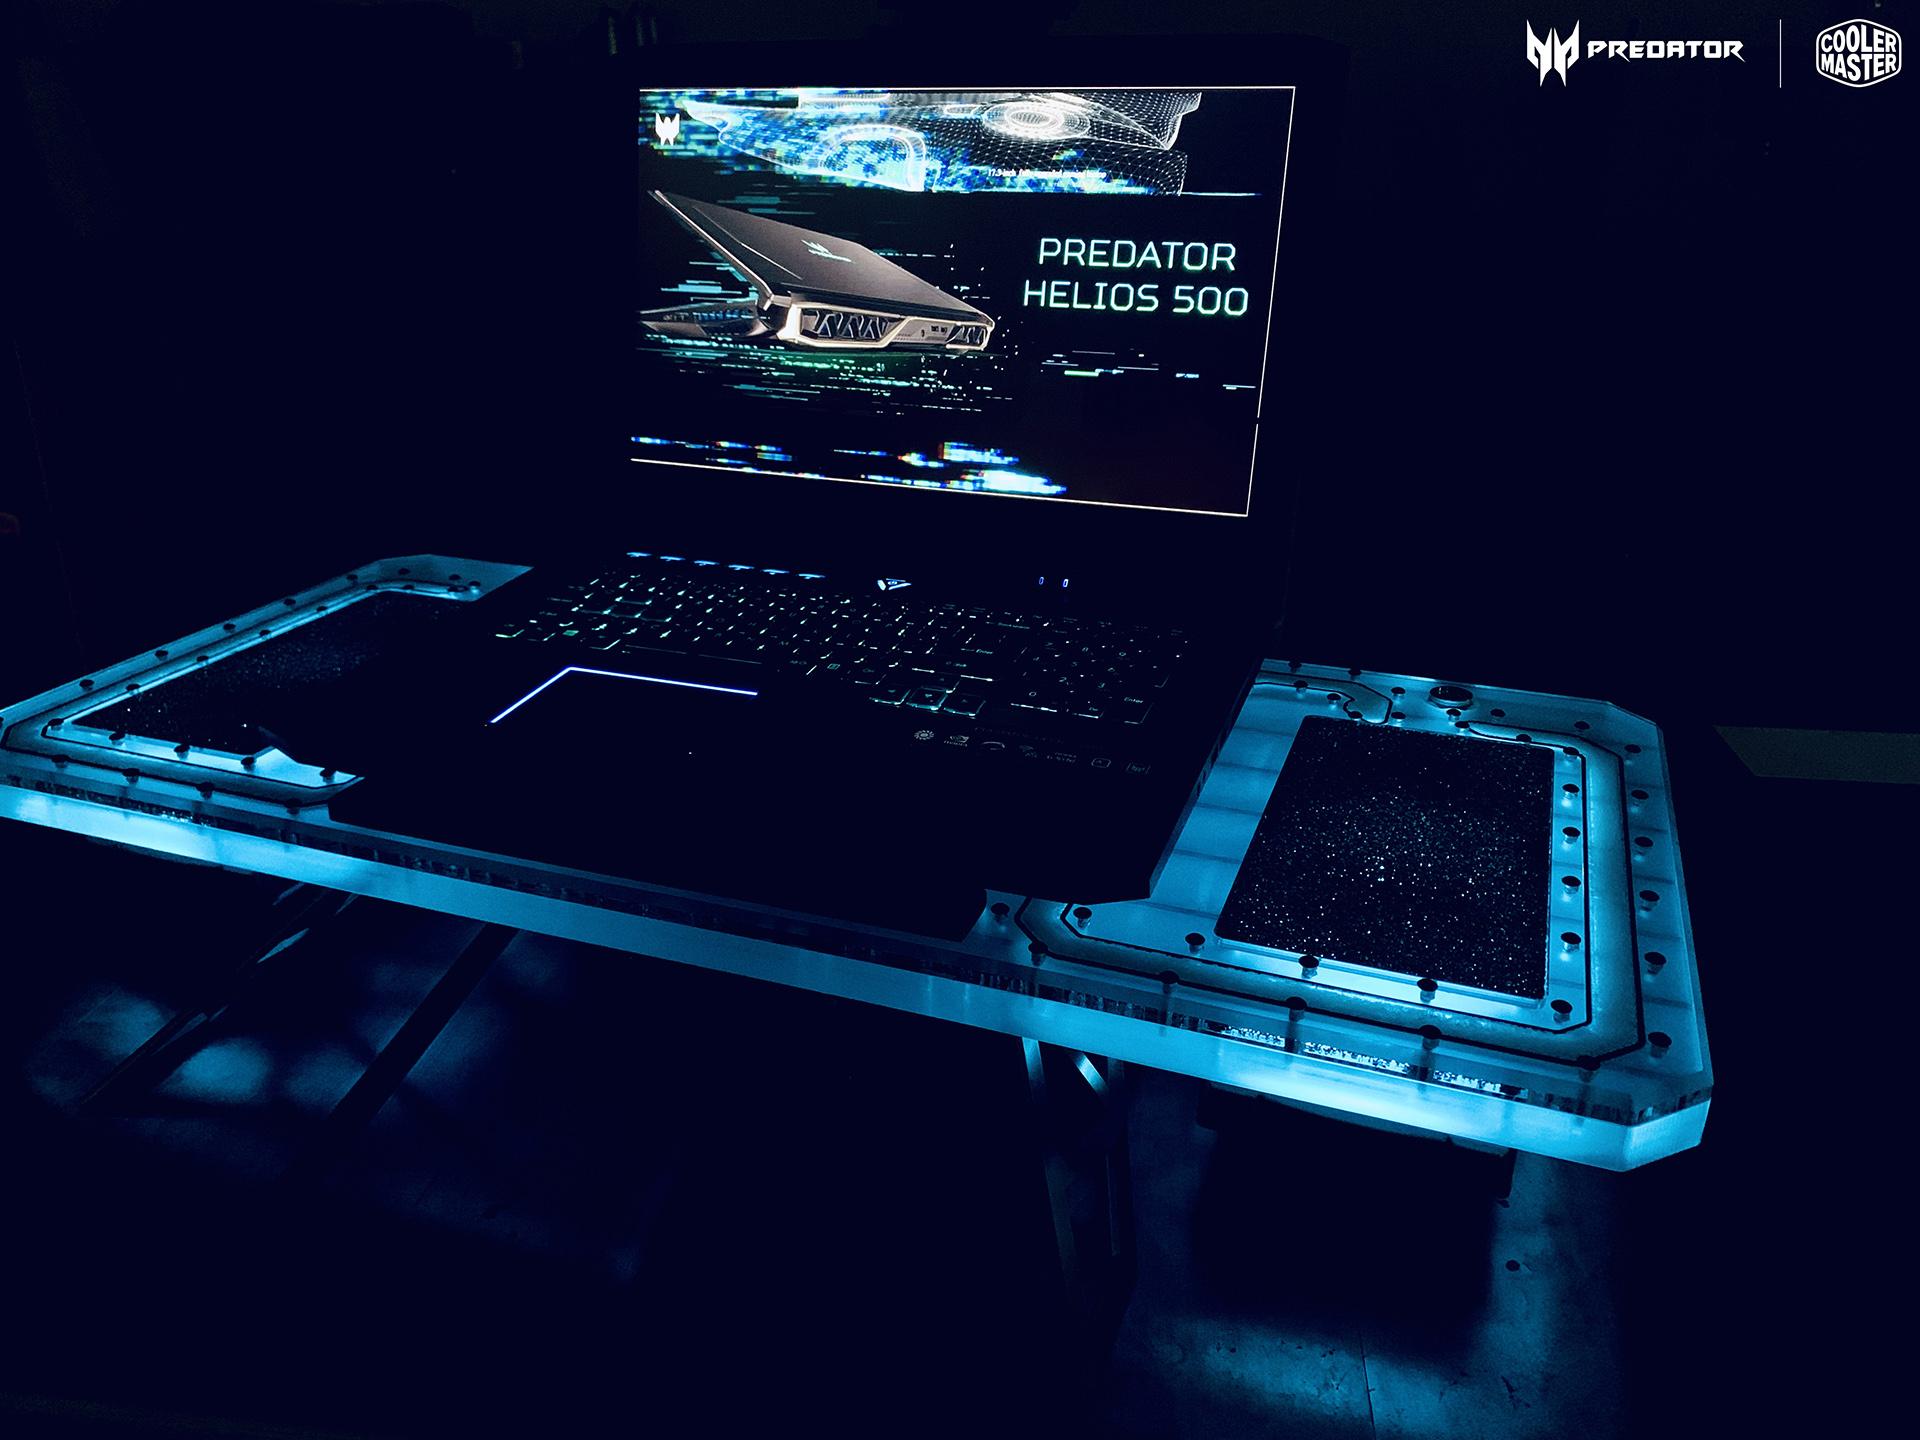 MOD Master Challenge Predator Helios 500 | Acer United States